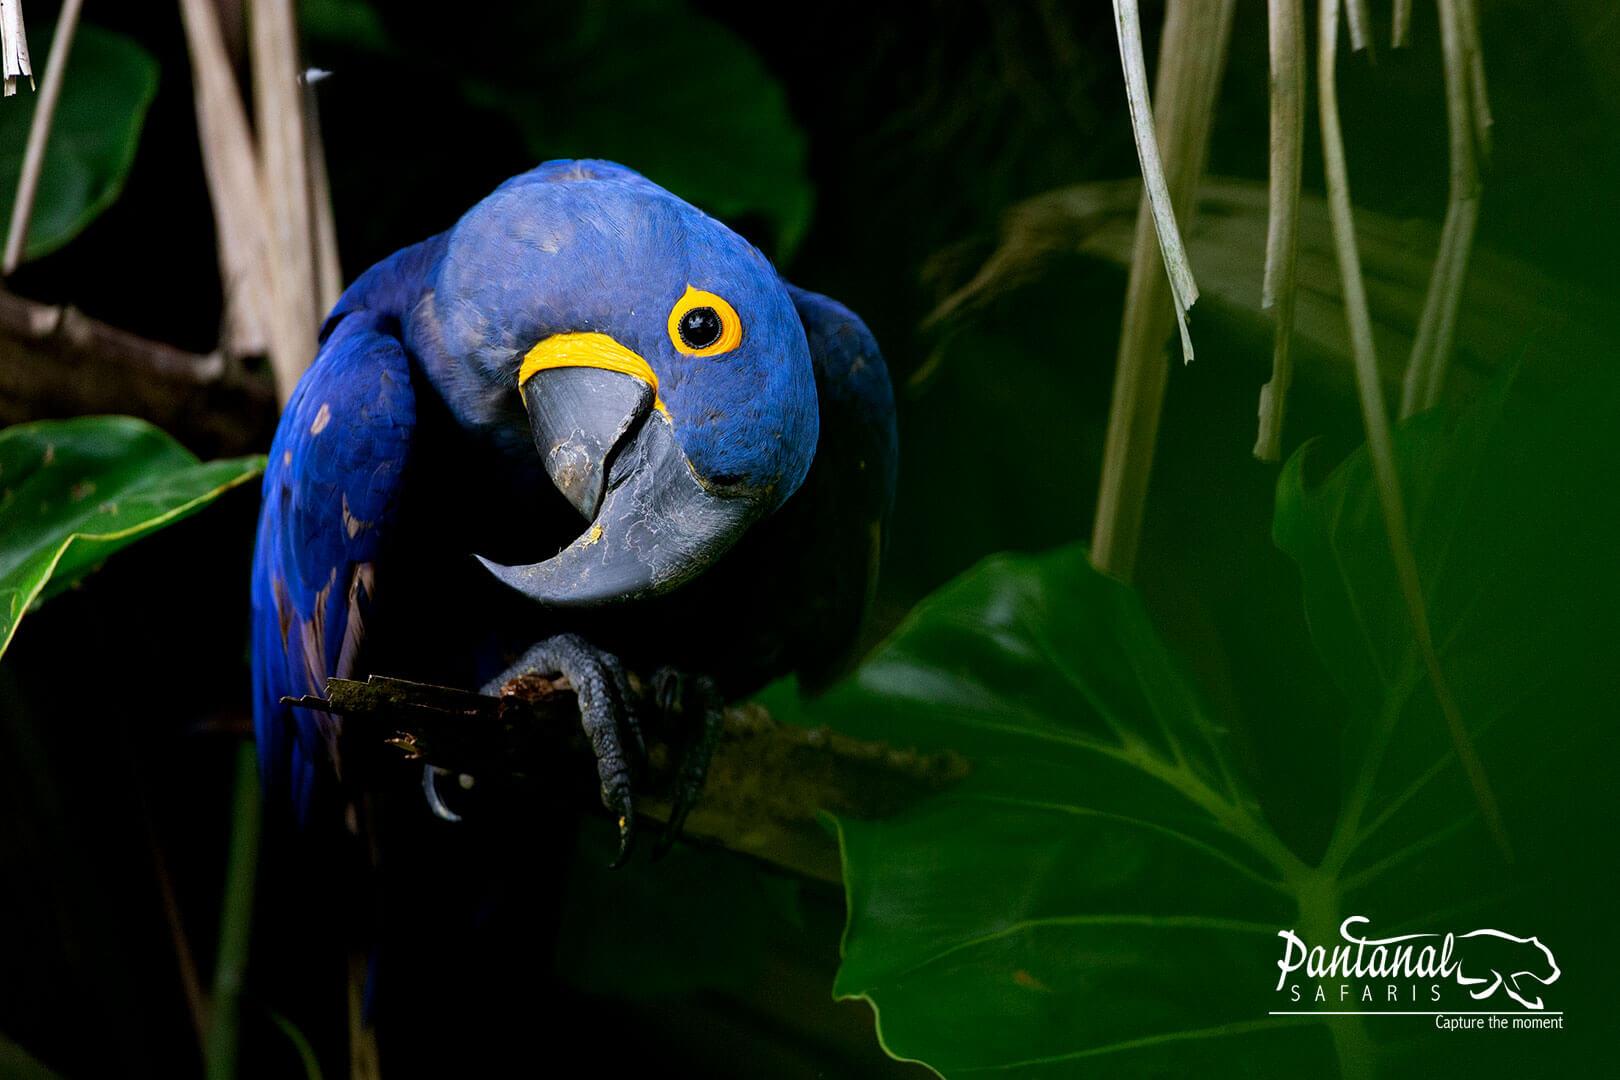 Pantanal wildlife hyacinth macaw